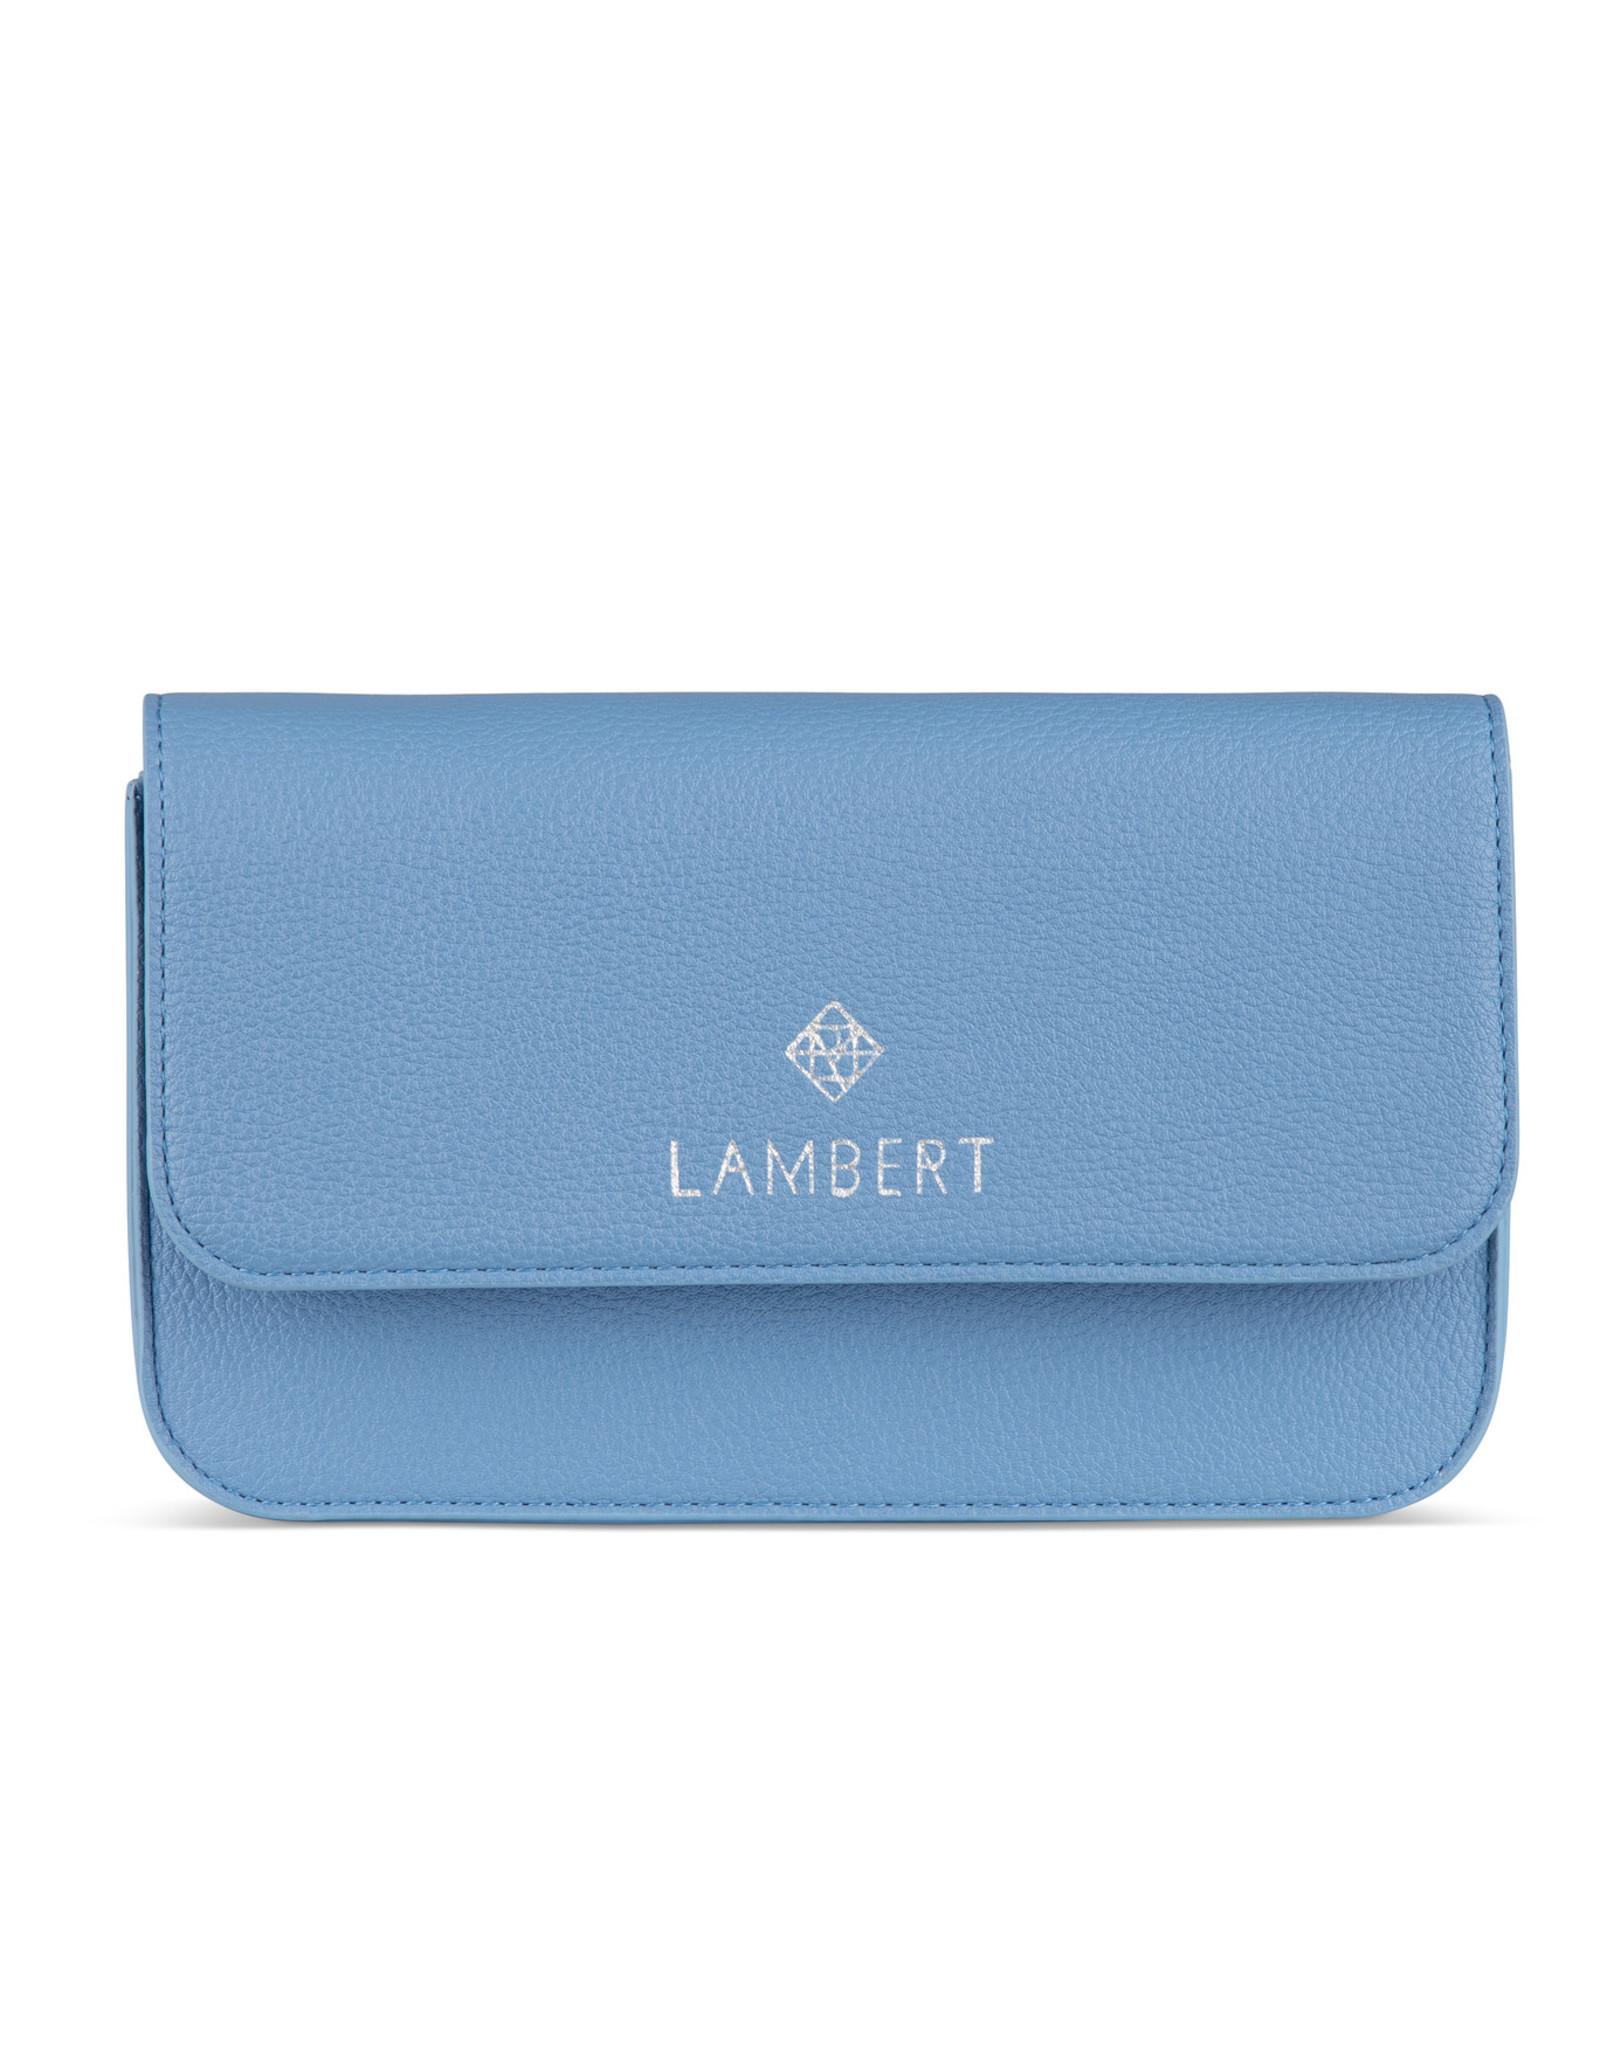 Lambert Gabrielle bleu Glacier